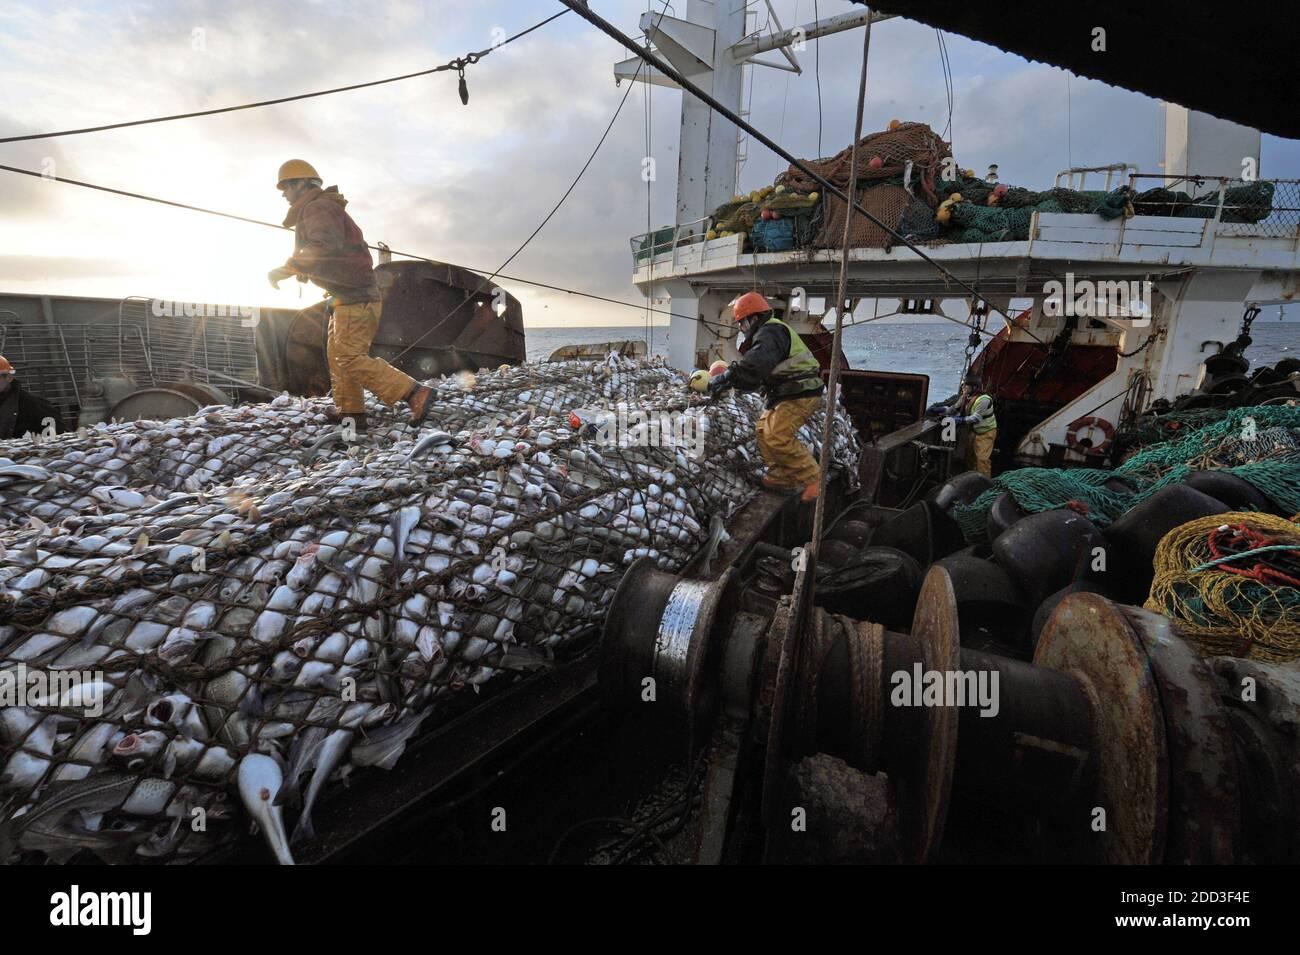 "Deep-sea fishing in the Norwegian Sea on board the trawler ""Grande Hermine"" in 2011. La Grande Hermine, factory trawler operated by Compagnie des Pech Stock Photo"